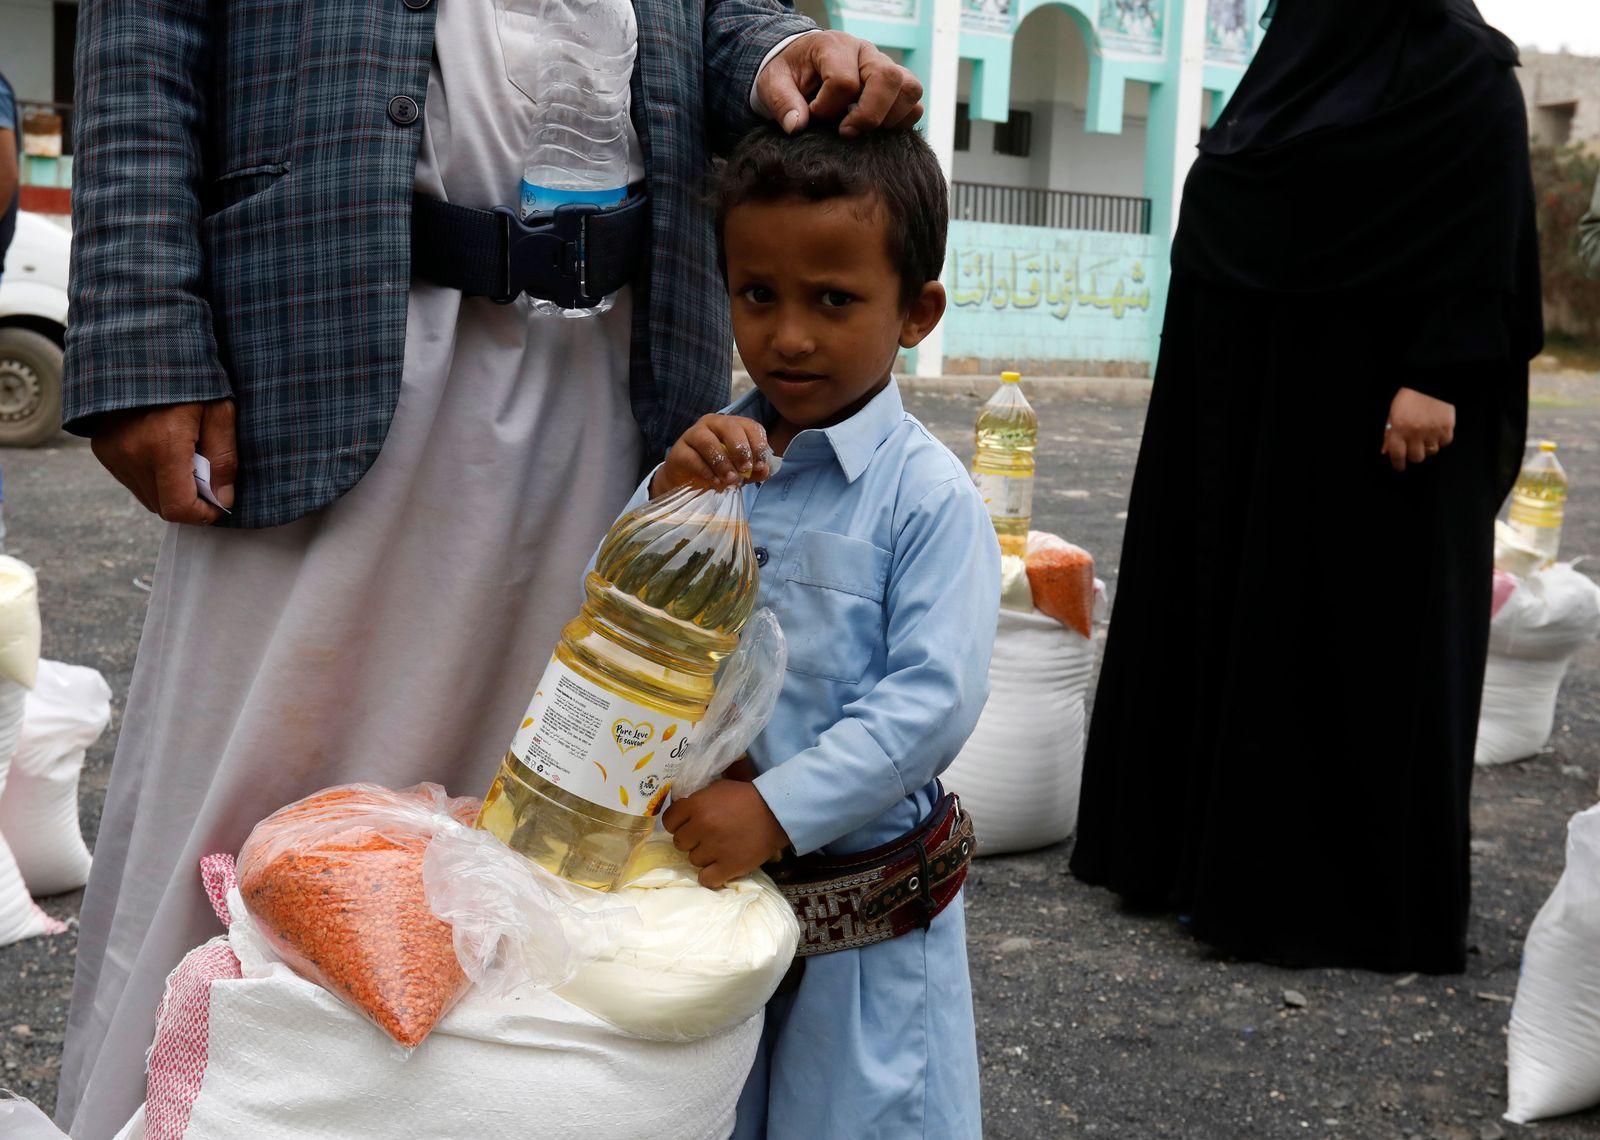 Humanitarian crisis in Yemen, Sanaa - 16 Jul 2020